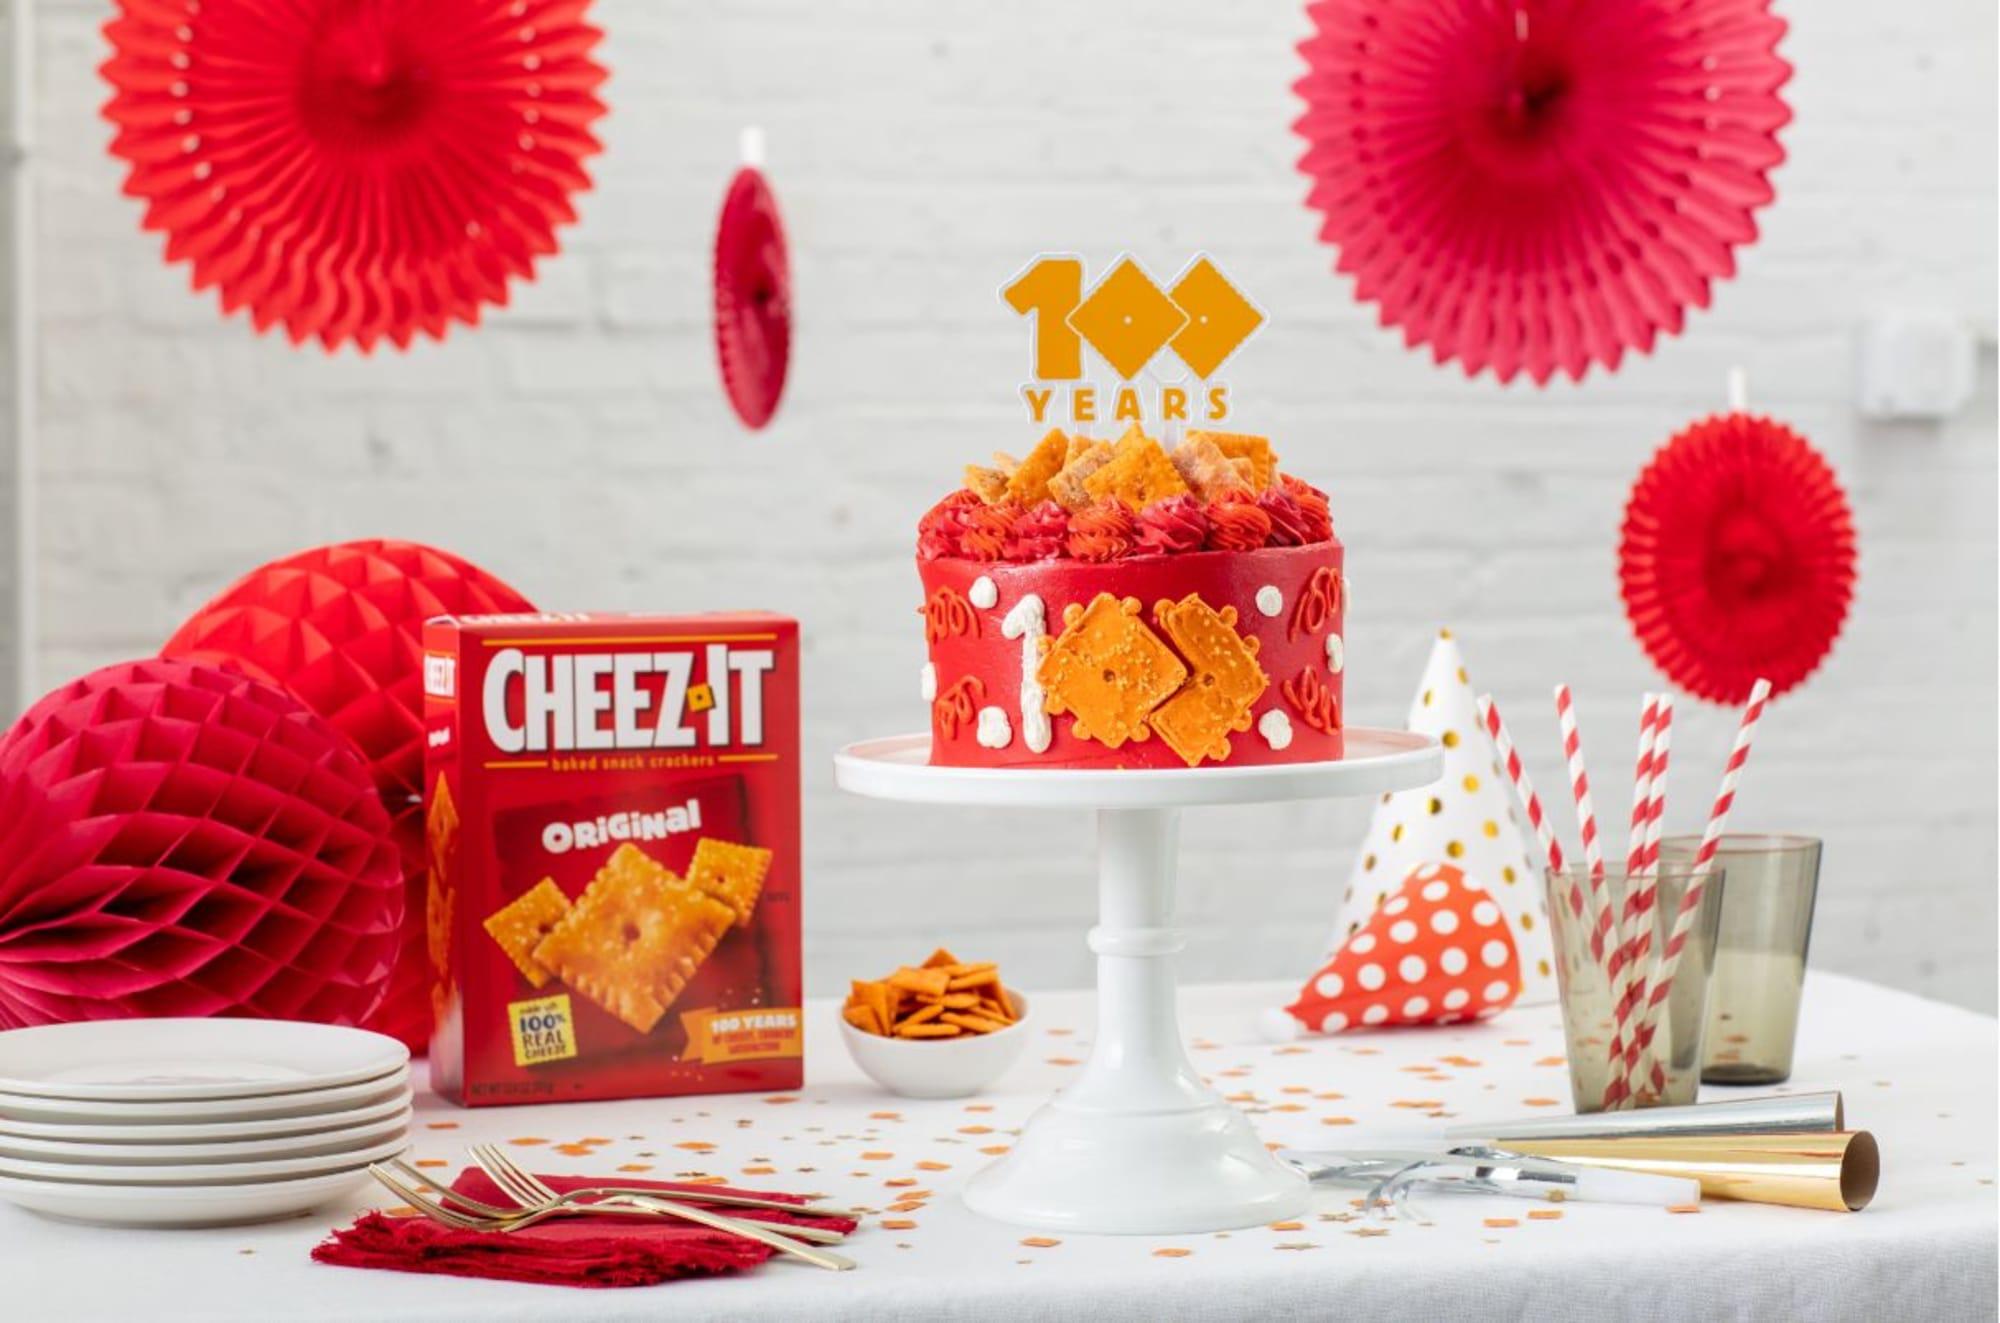 The Cheez-It Cheez-Itennial Cake is a delicious Stephanie Izard creation